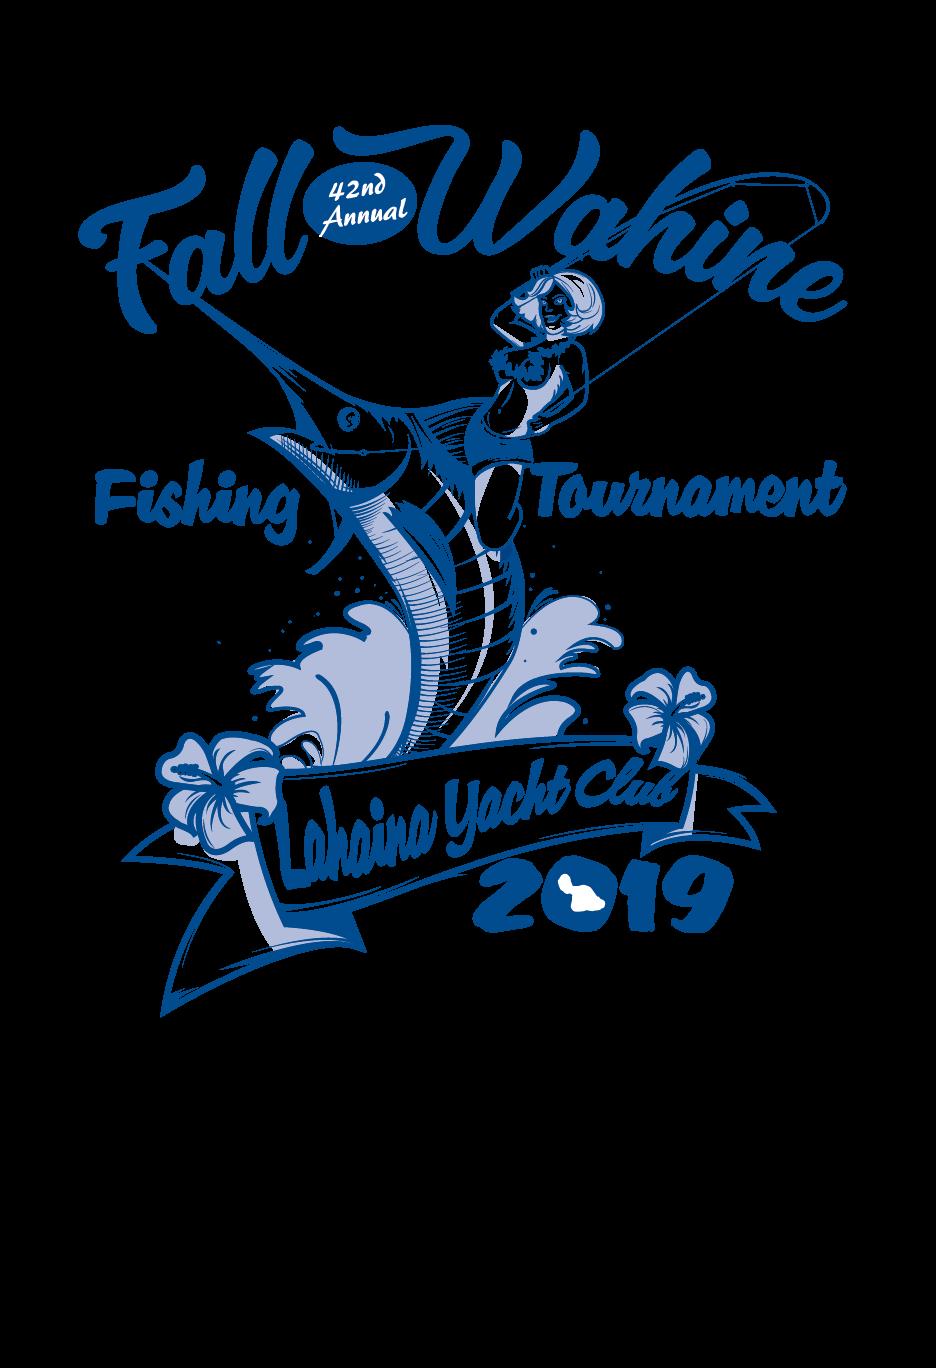 FALL WAHINE - NOV 1, 2019